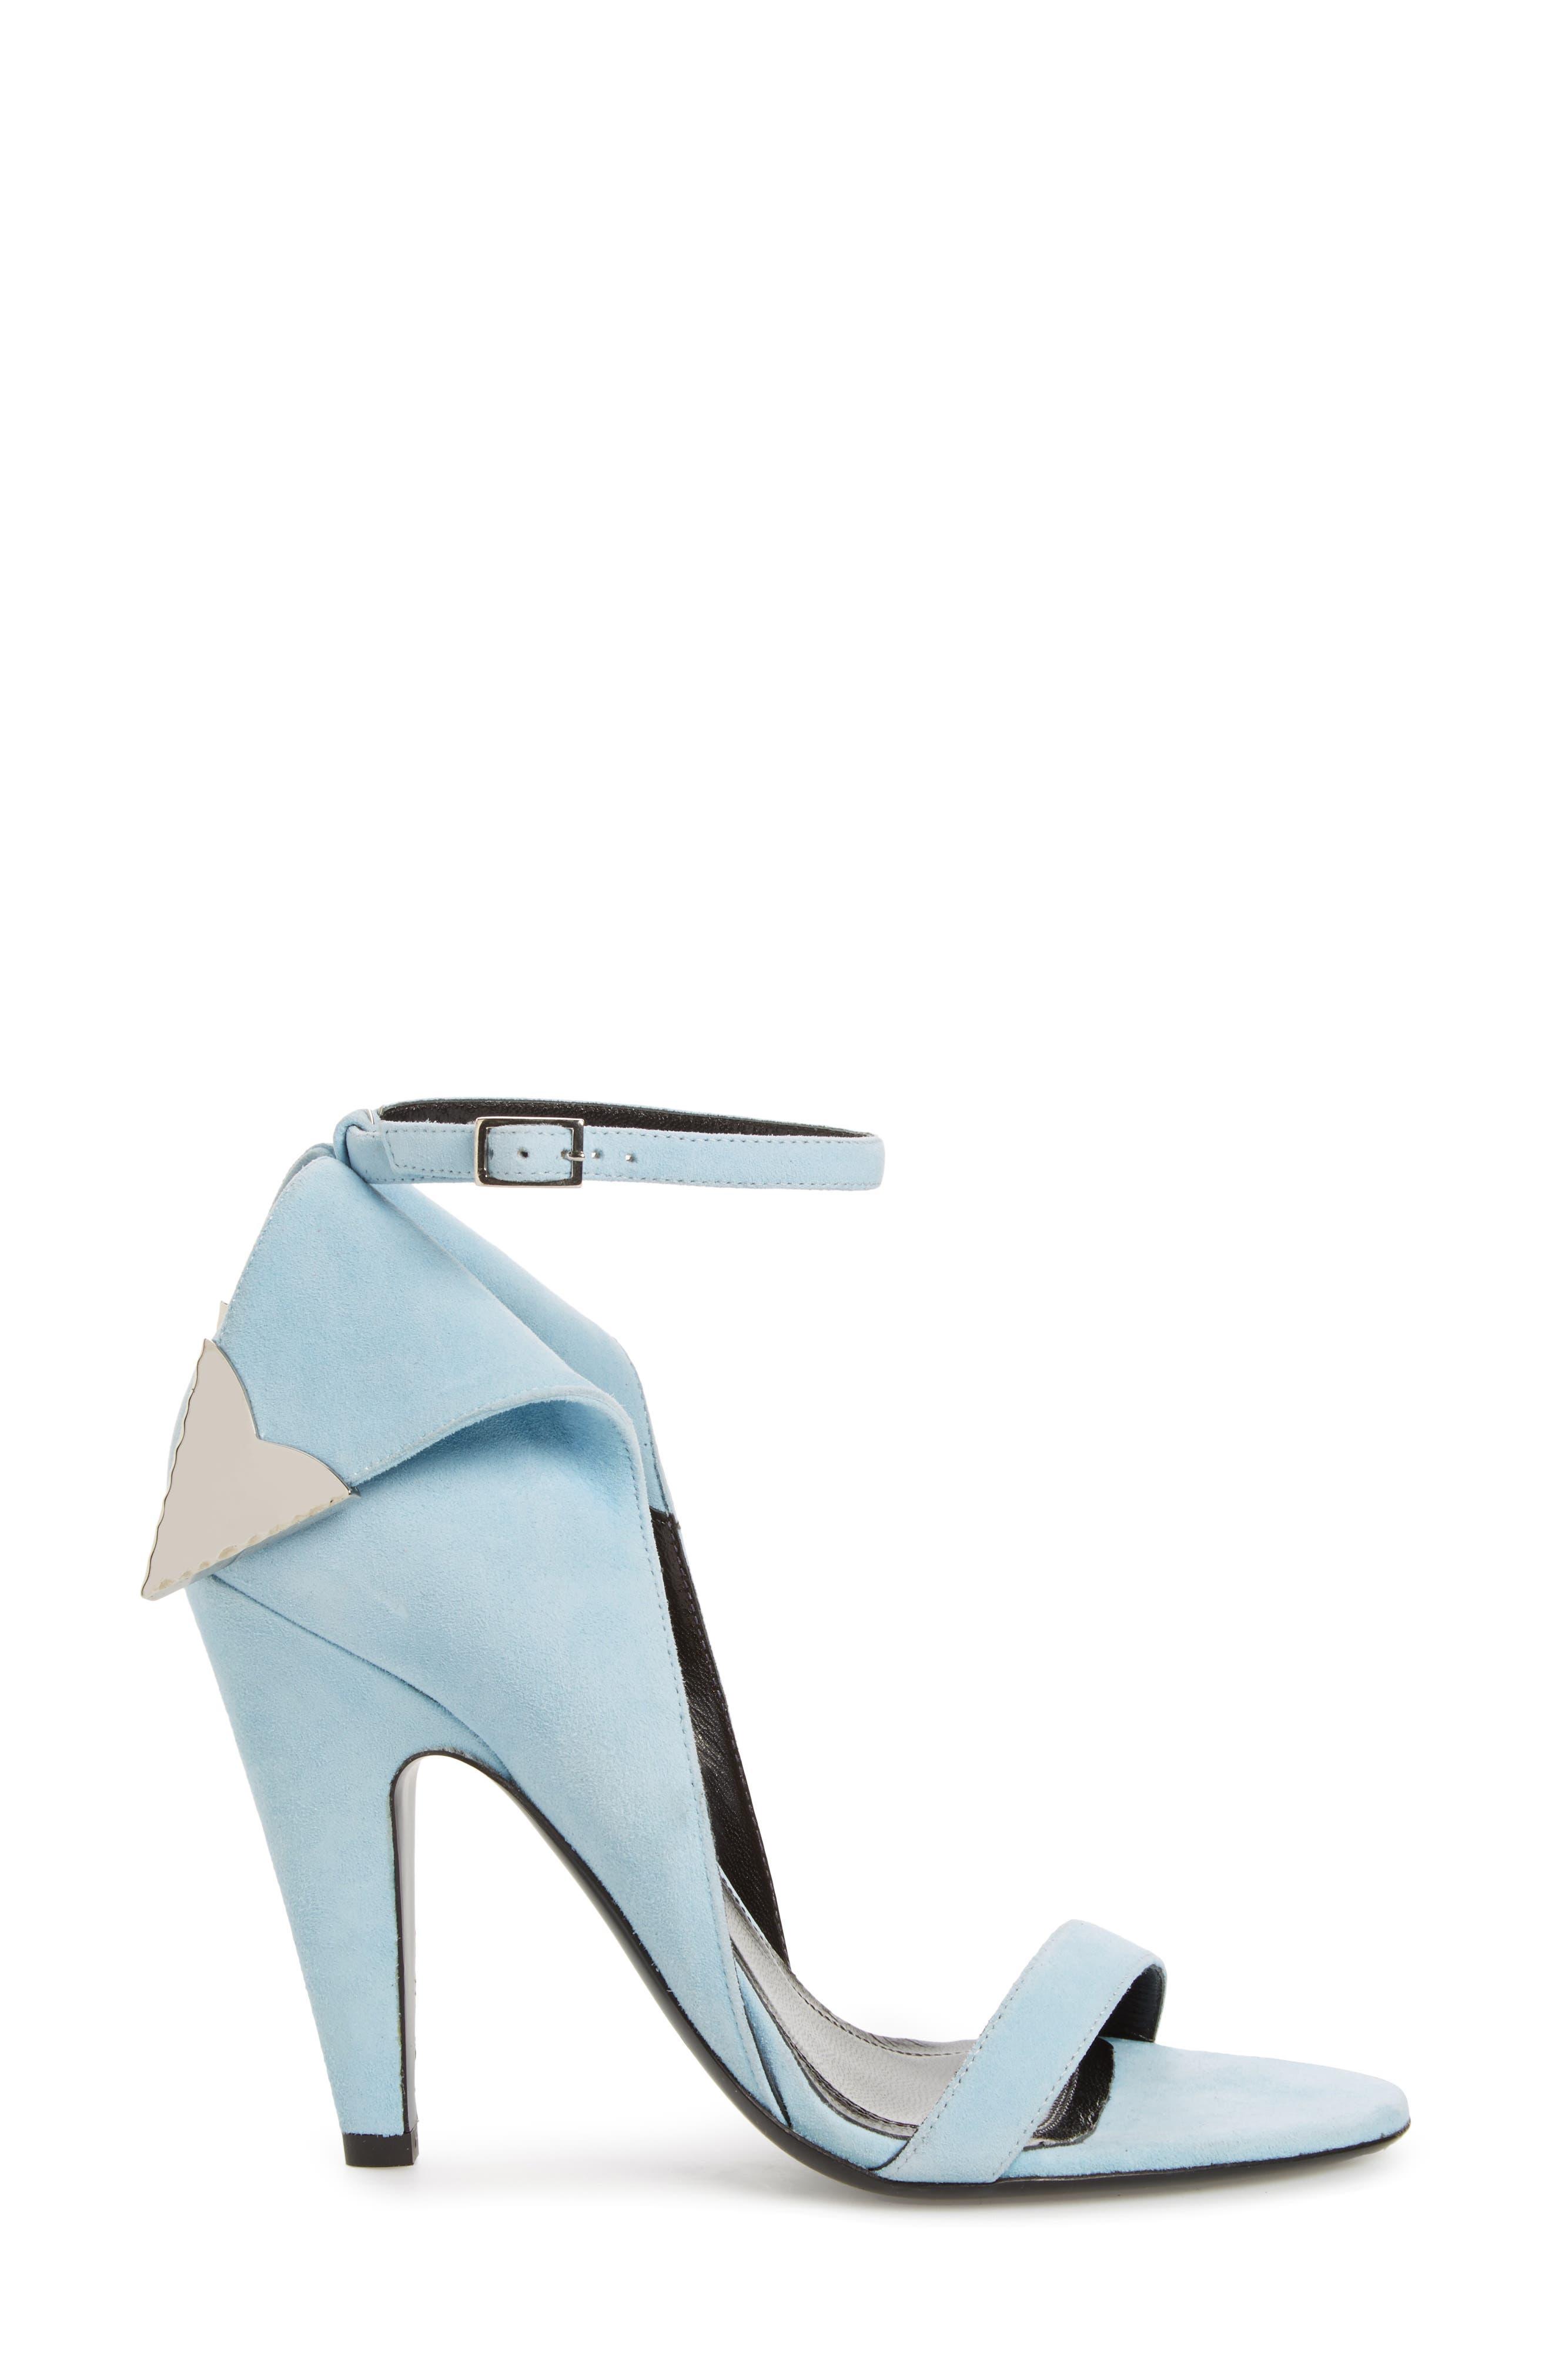 Leititia Ankle Strap Sandal,                             Alternate thumbnail 3, color,                             400